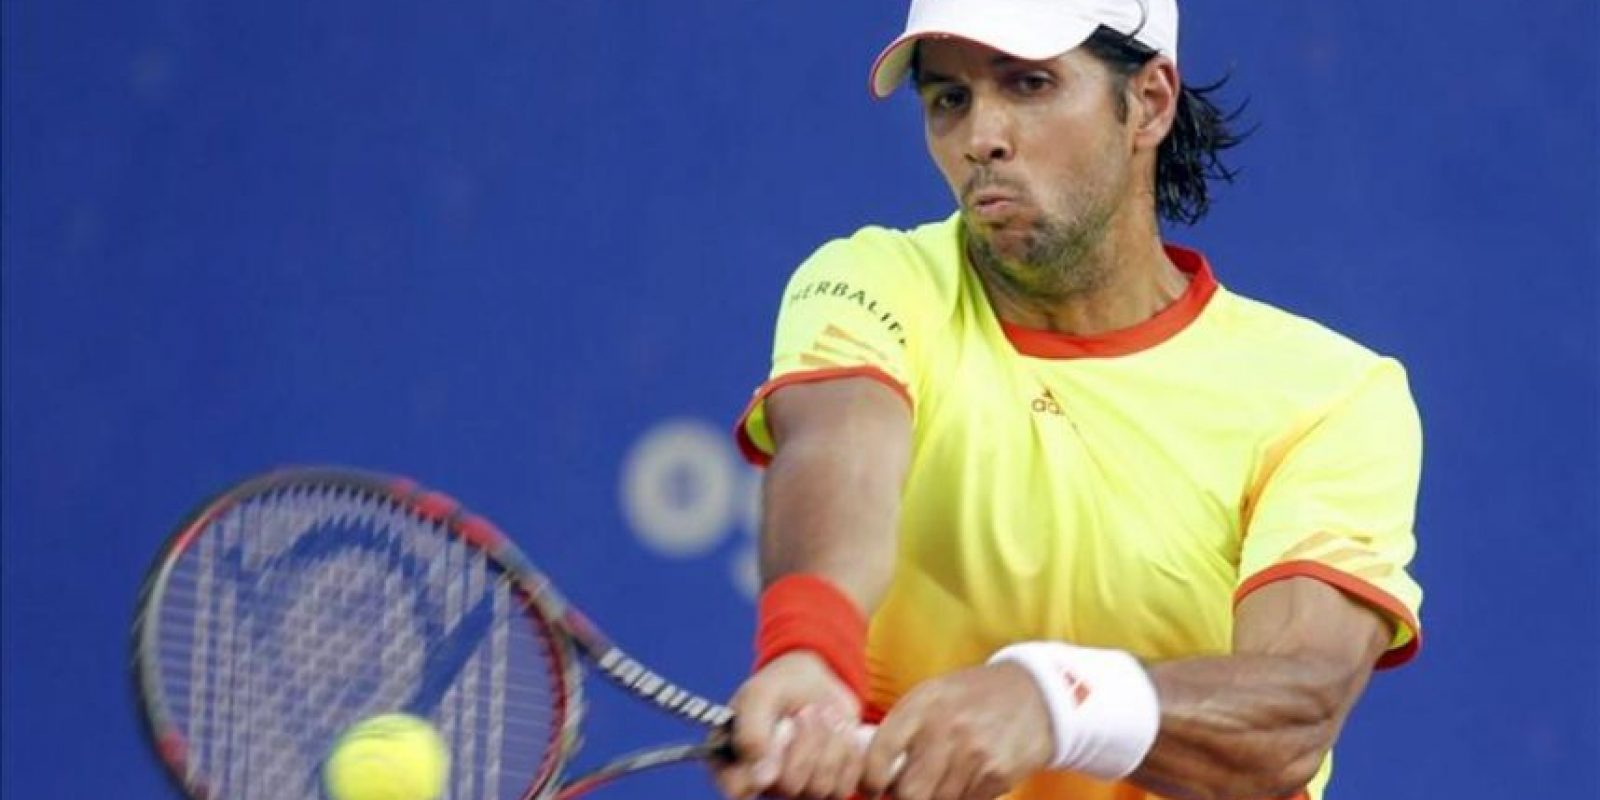 El tenista español Fernando Verdasco devuelve una pelota al japonés Kei Nishikori. EFE